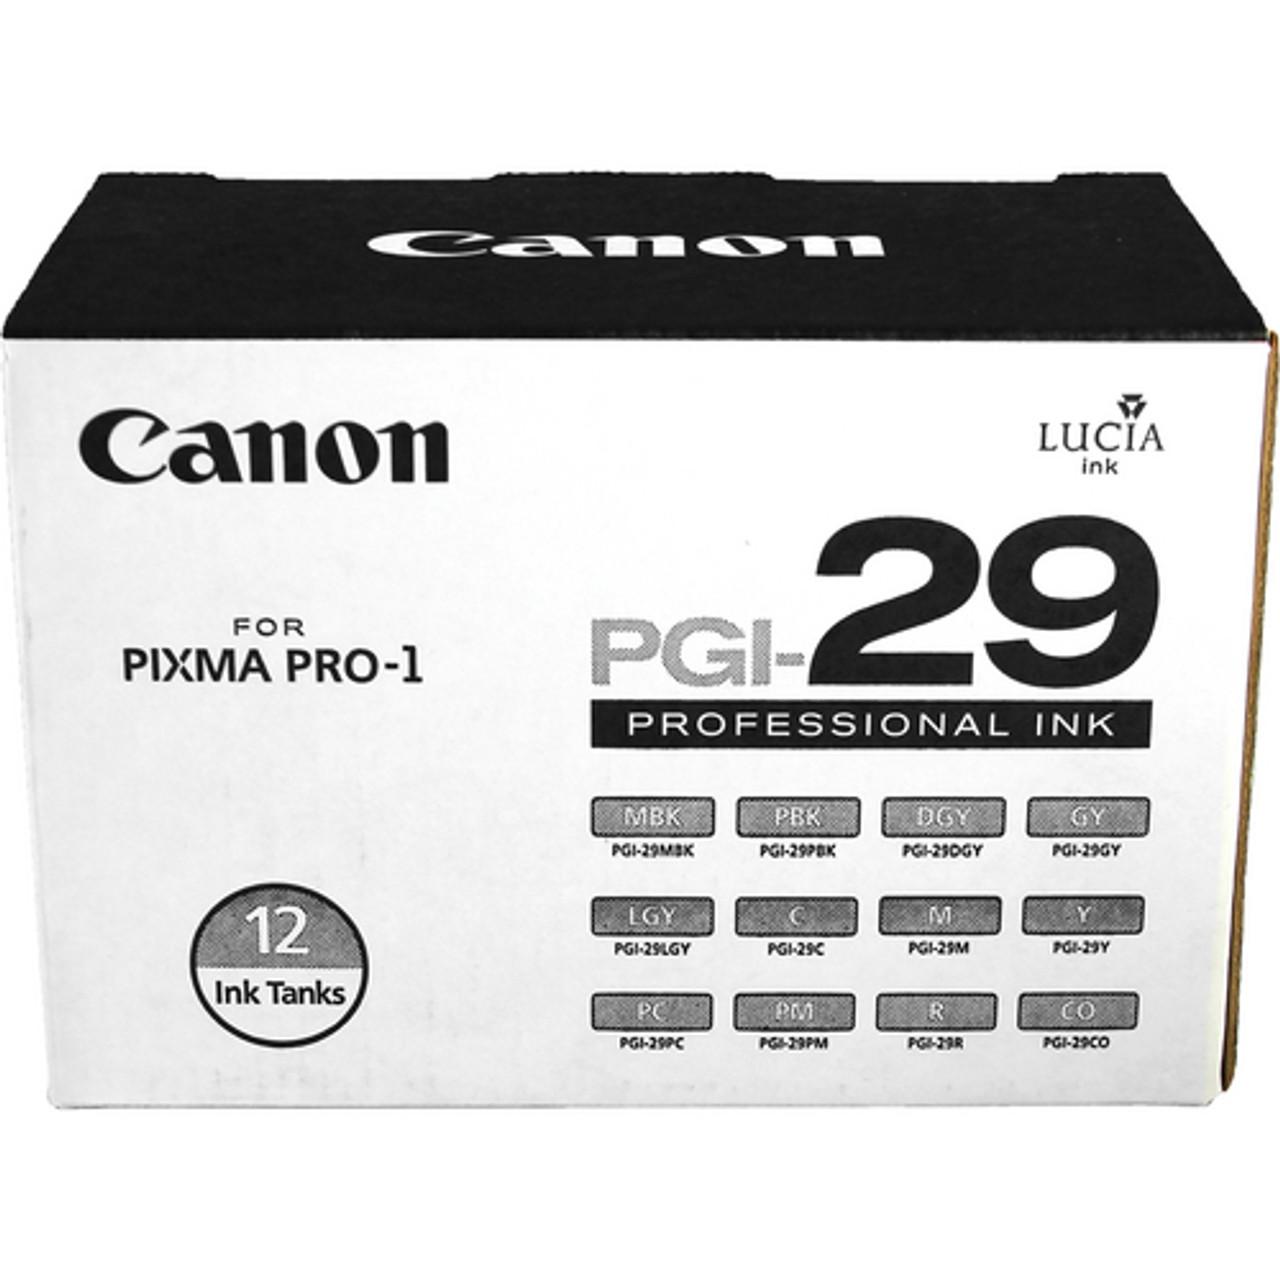 Canon PGI-29 Color Ink Tanks (pack of 12)